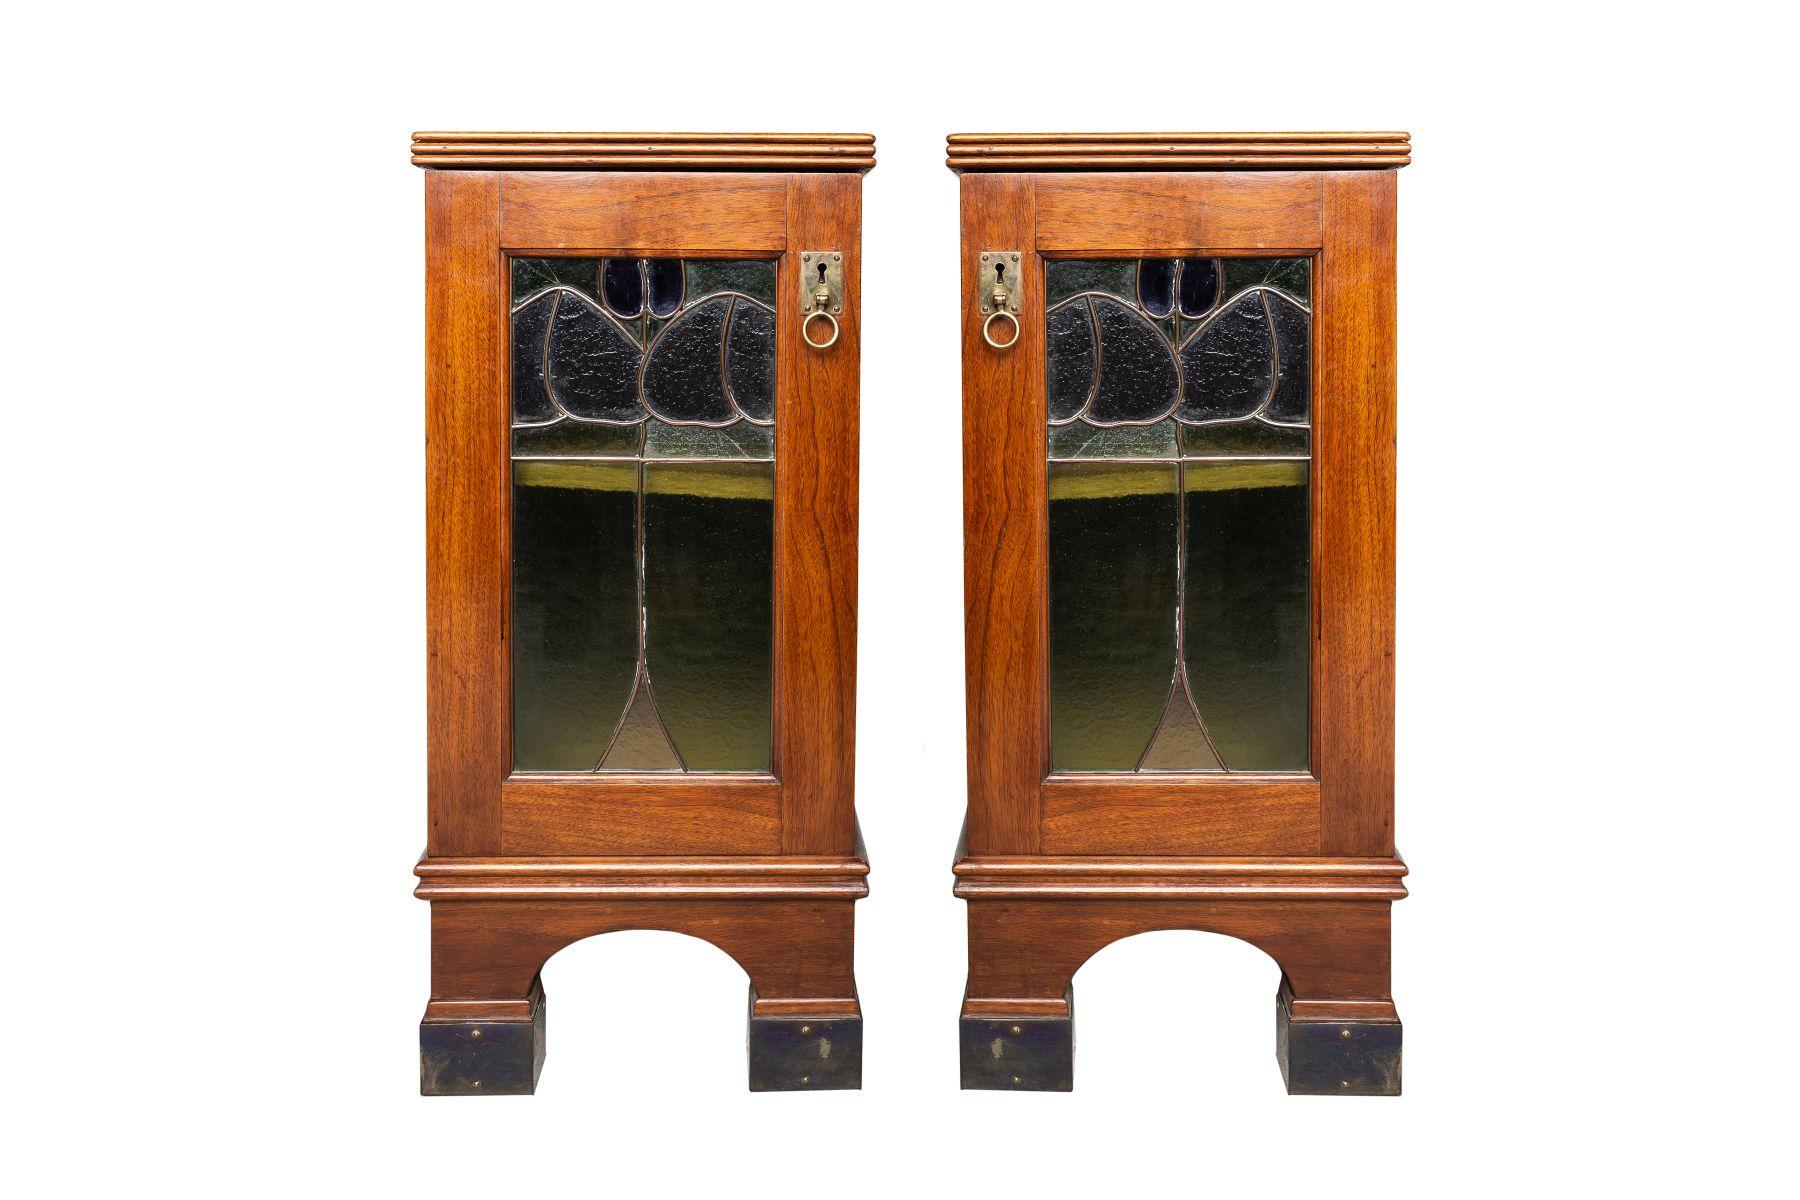 #132 2 small cupboards | Nachtschränkchen Anfang 20. Jahrhundert Image